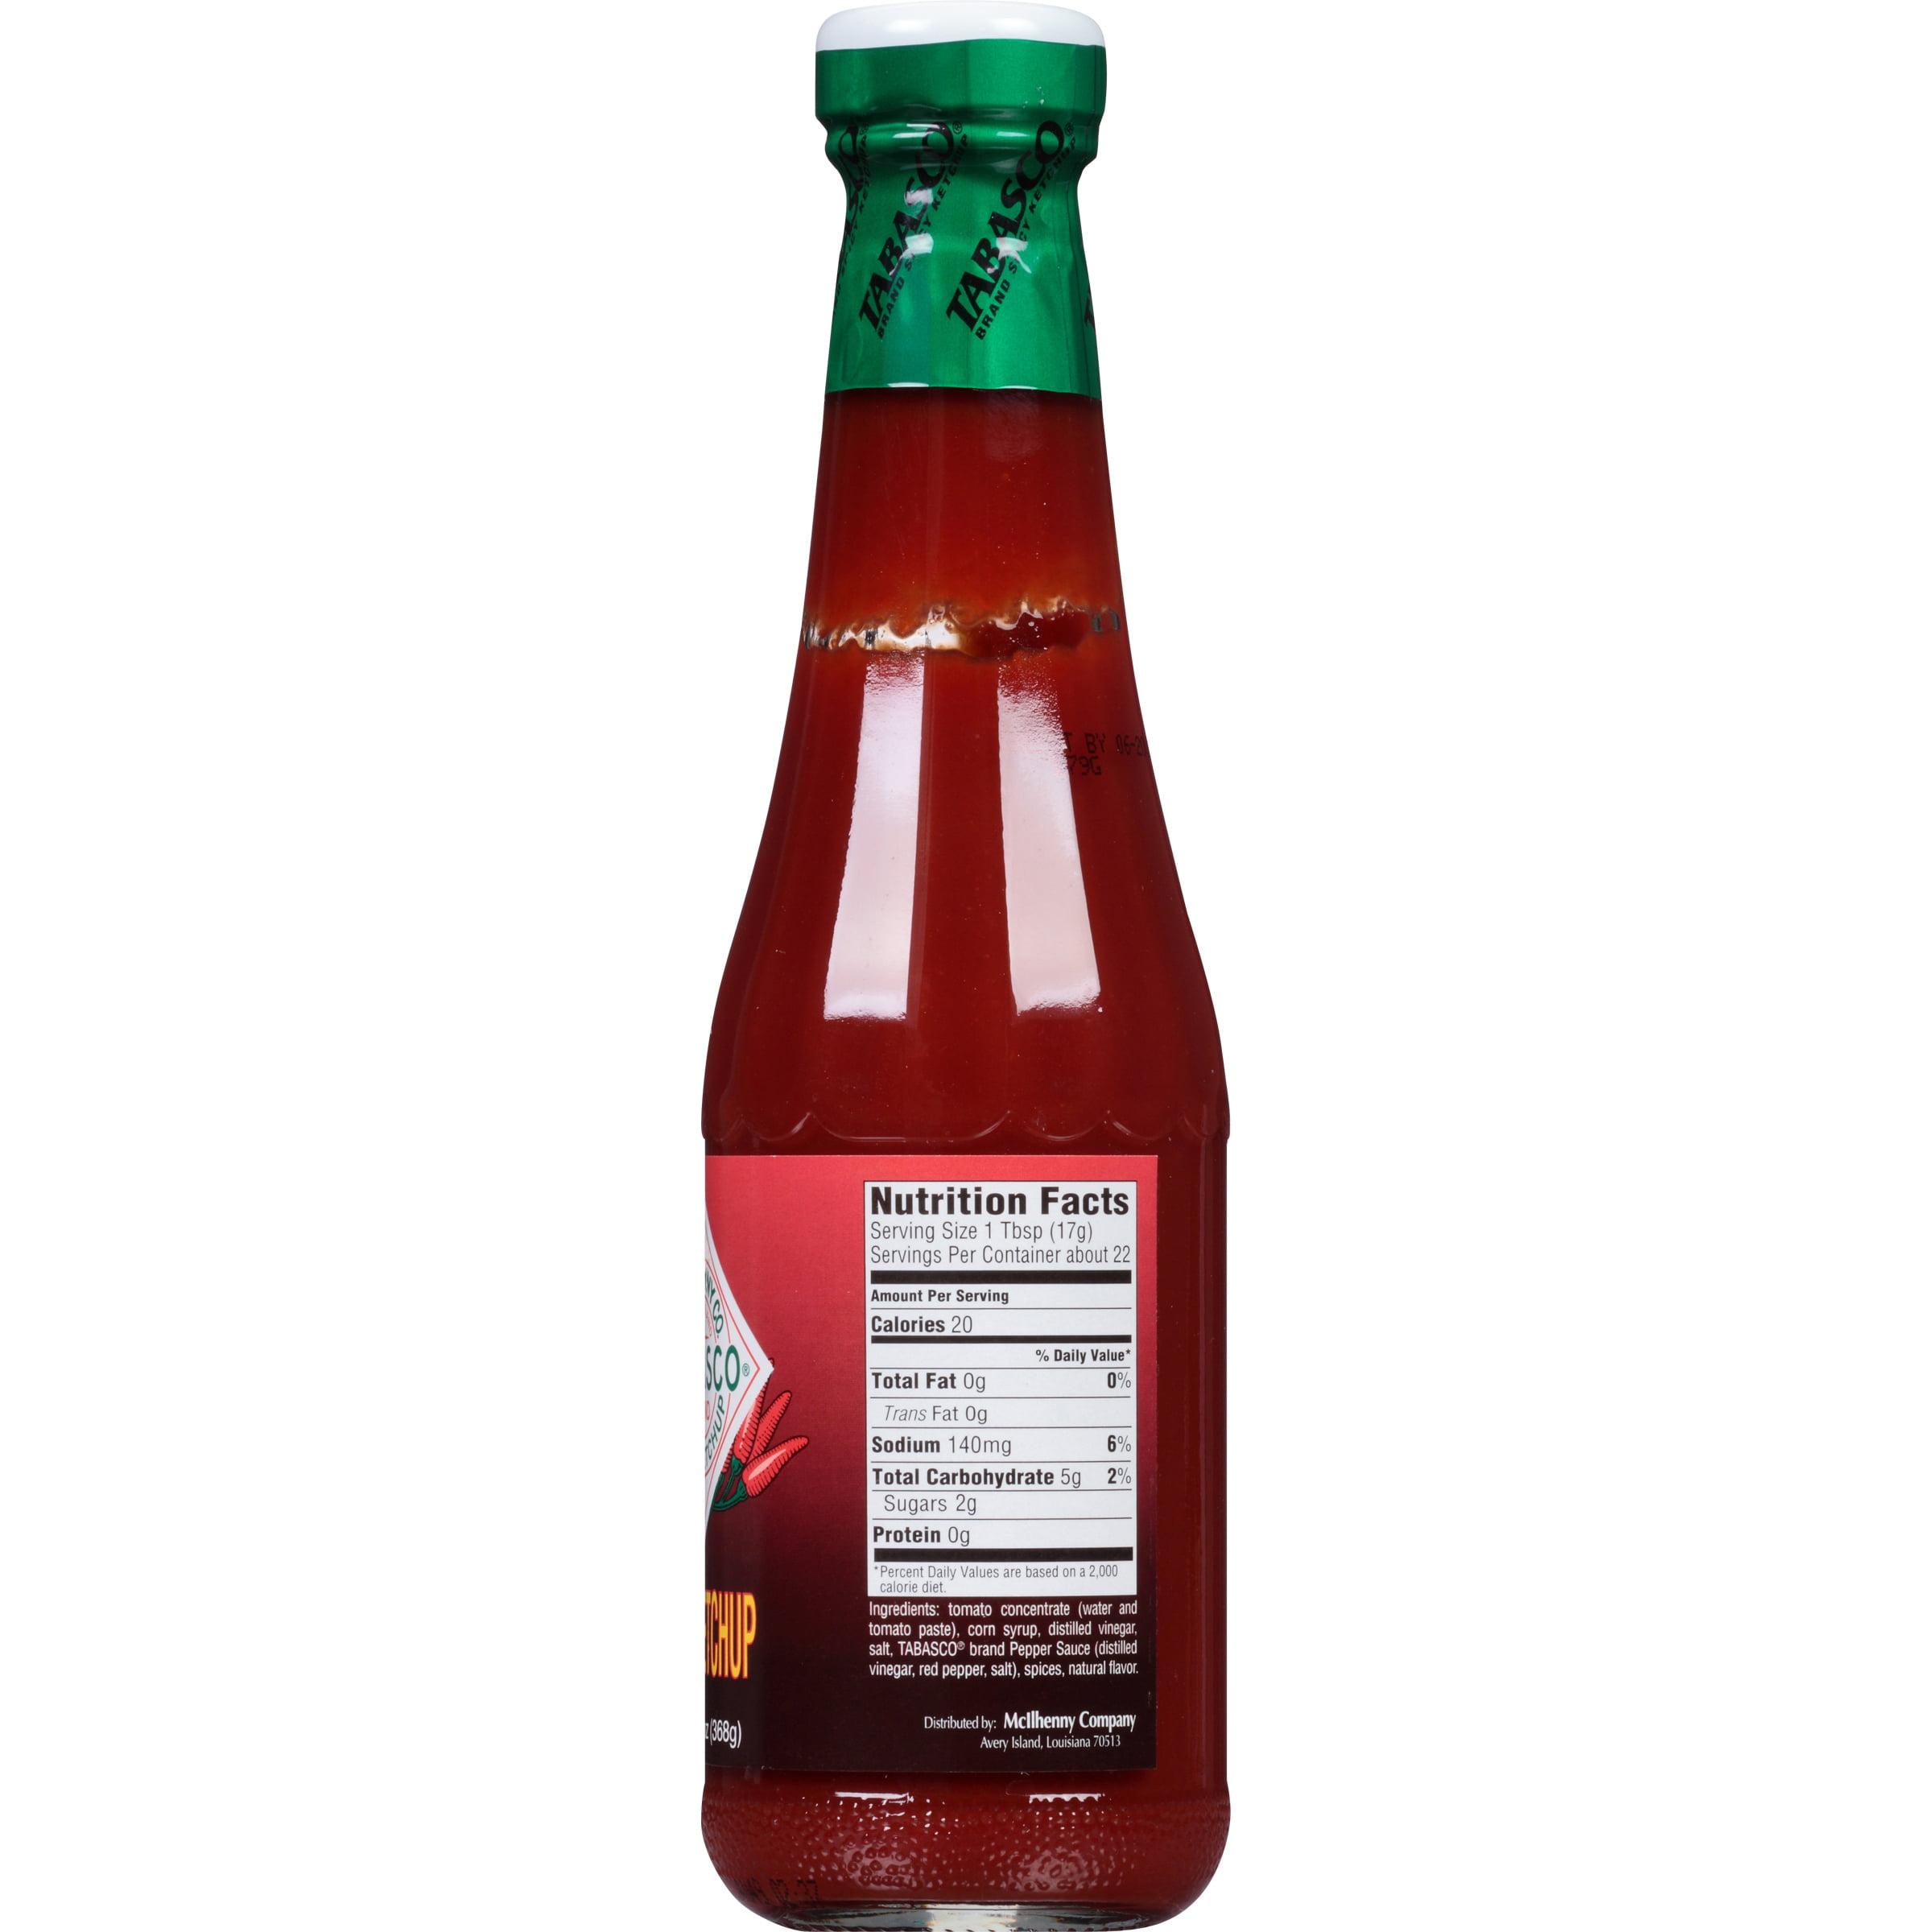 McIlhenny Co. Tabasco® Brand Spicy Ketchup 13 oz. Bottle - Walmart.com